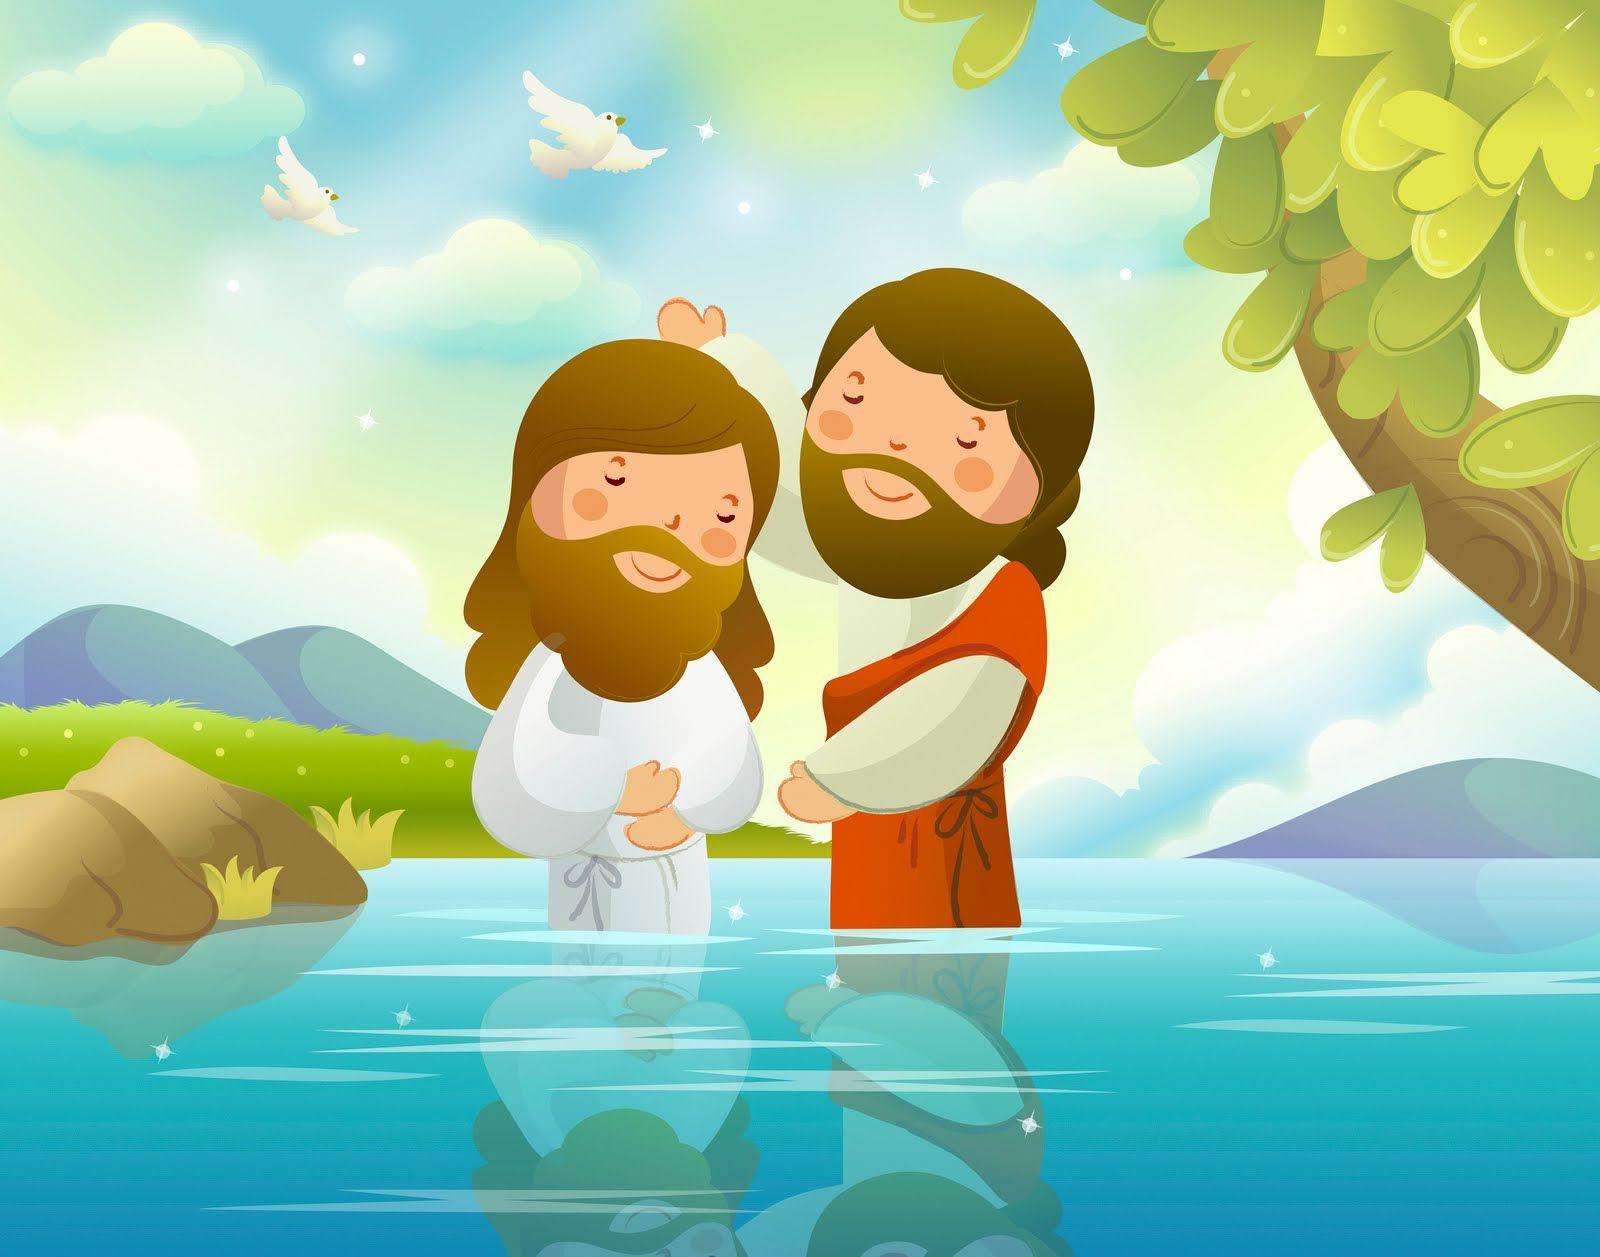 Pin By Carol Hurtado On Cebra John The Baptist Jesus Cartoon Bible Illustrations